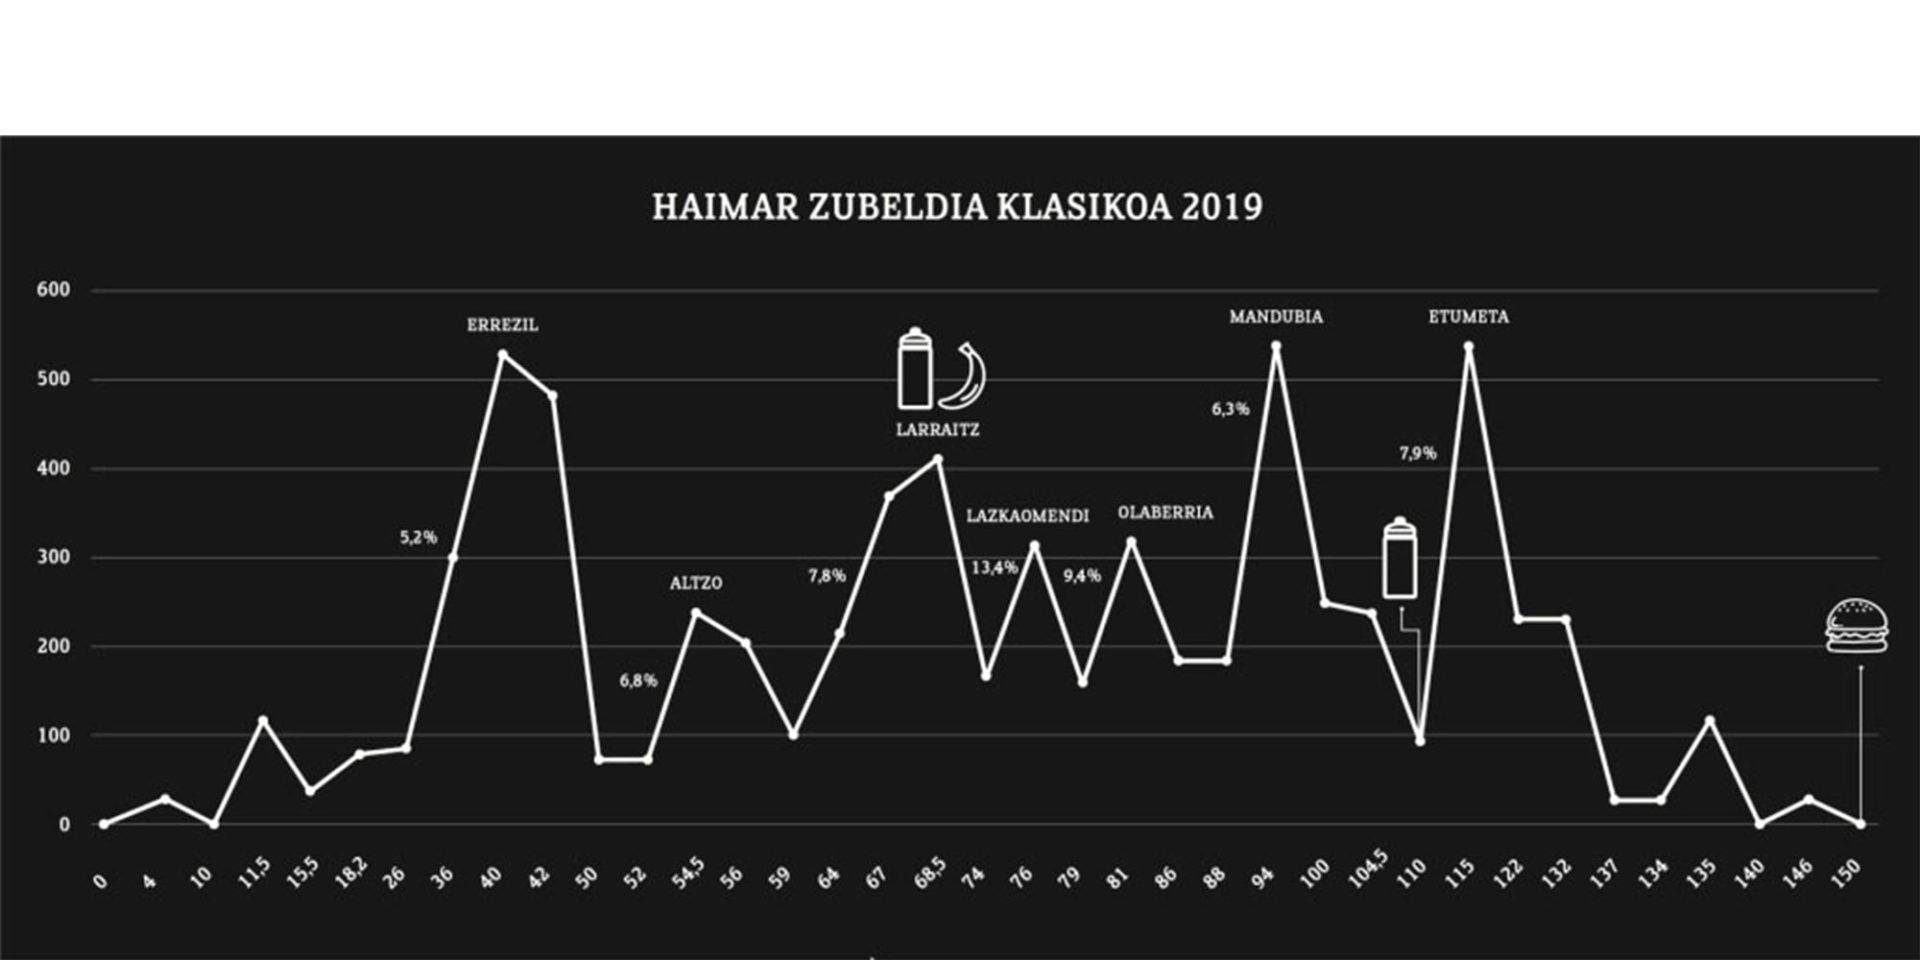 Perfil Marcha Cicloturista Clásica Haimar Zubeldia 2019